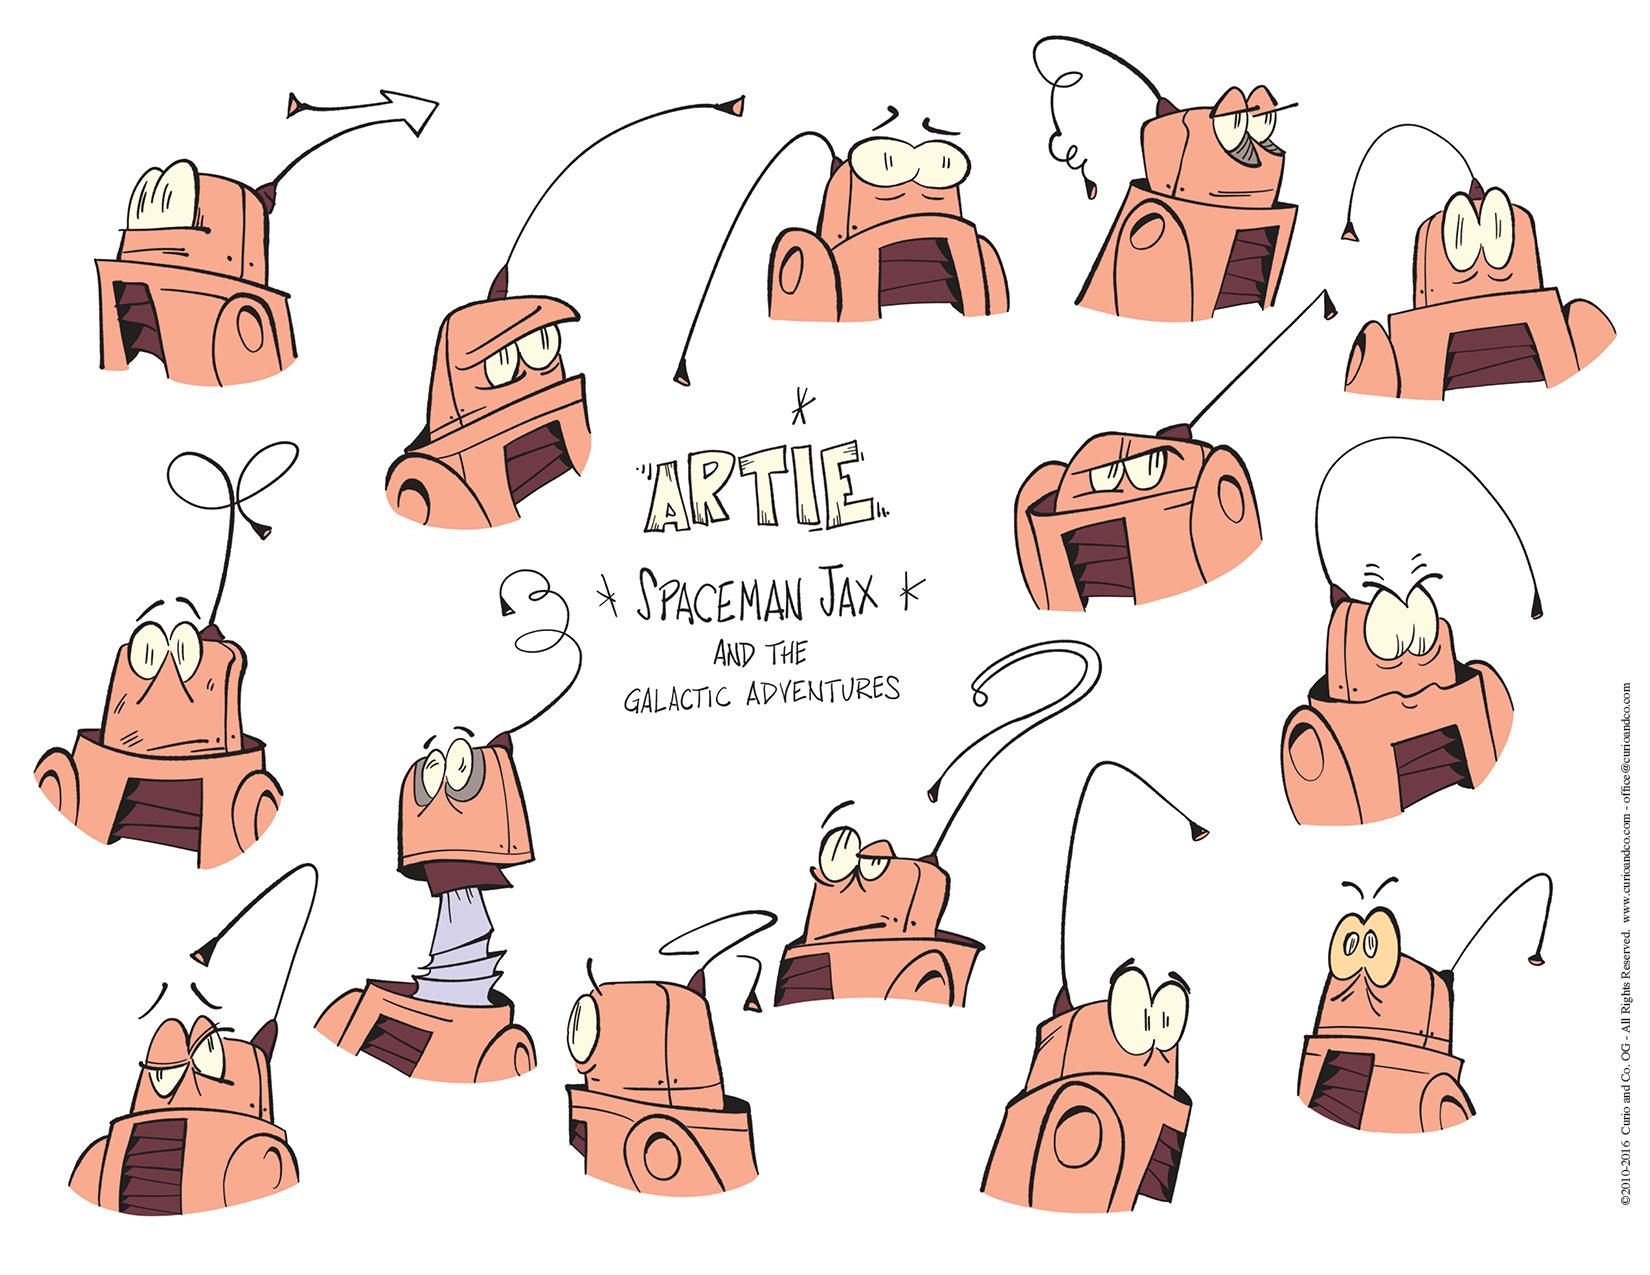 Spaceman Jax - Artie facial expressions - model sheet